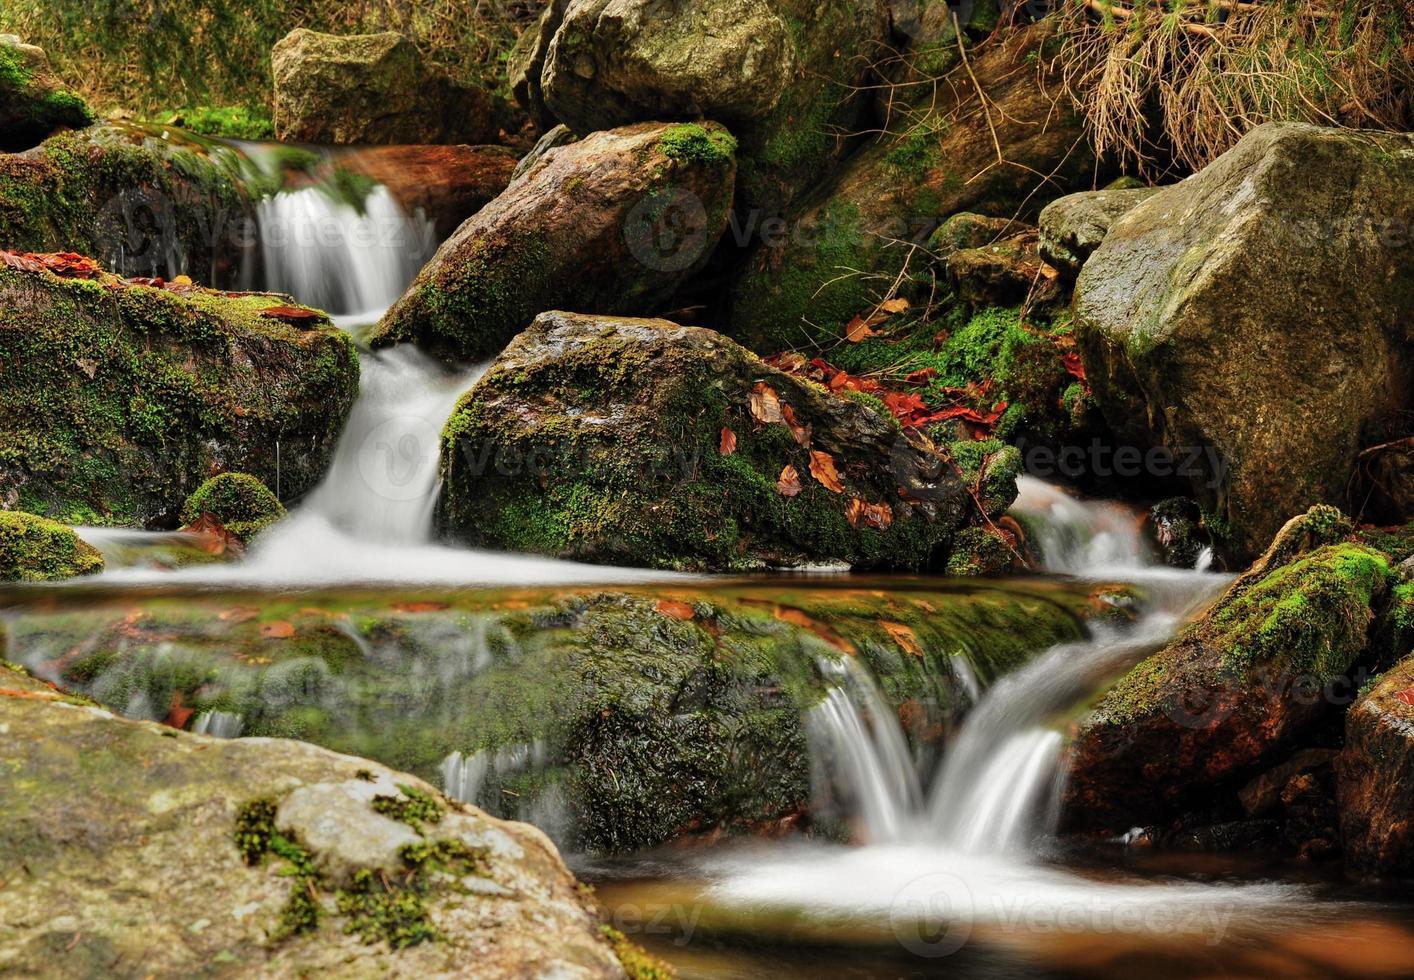 Spring creek photo